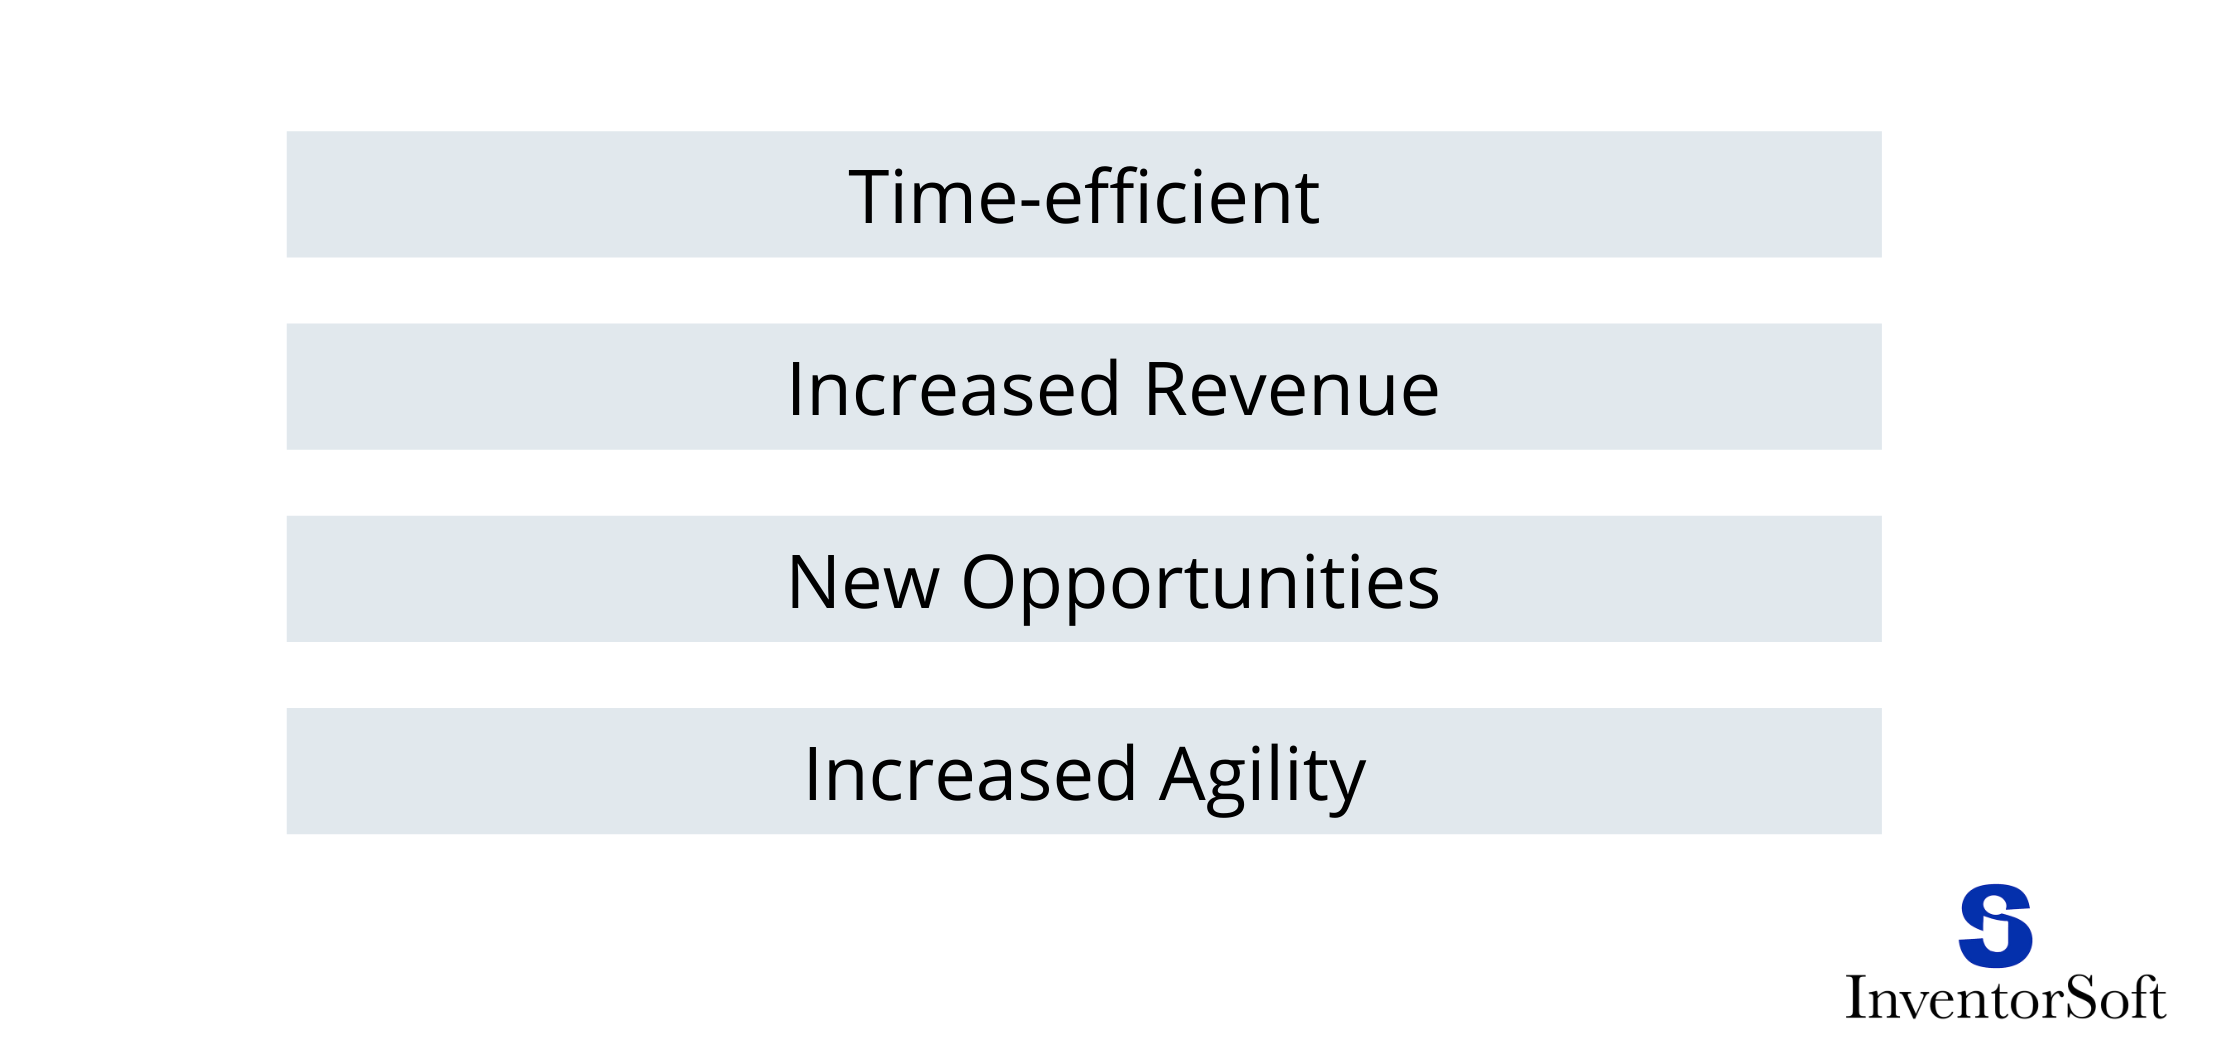 coronavirus impact on business: benefits of a successful transformation